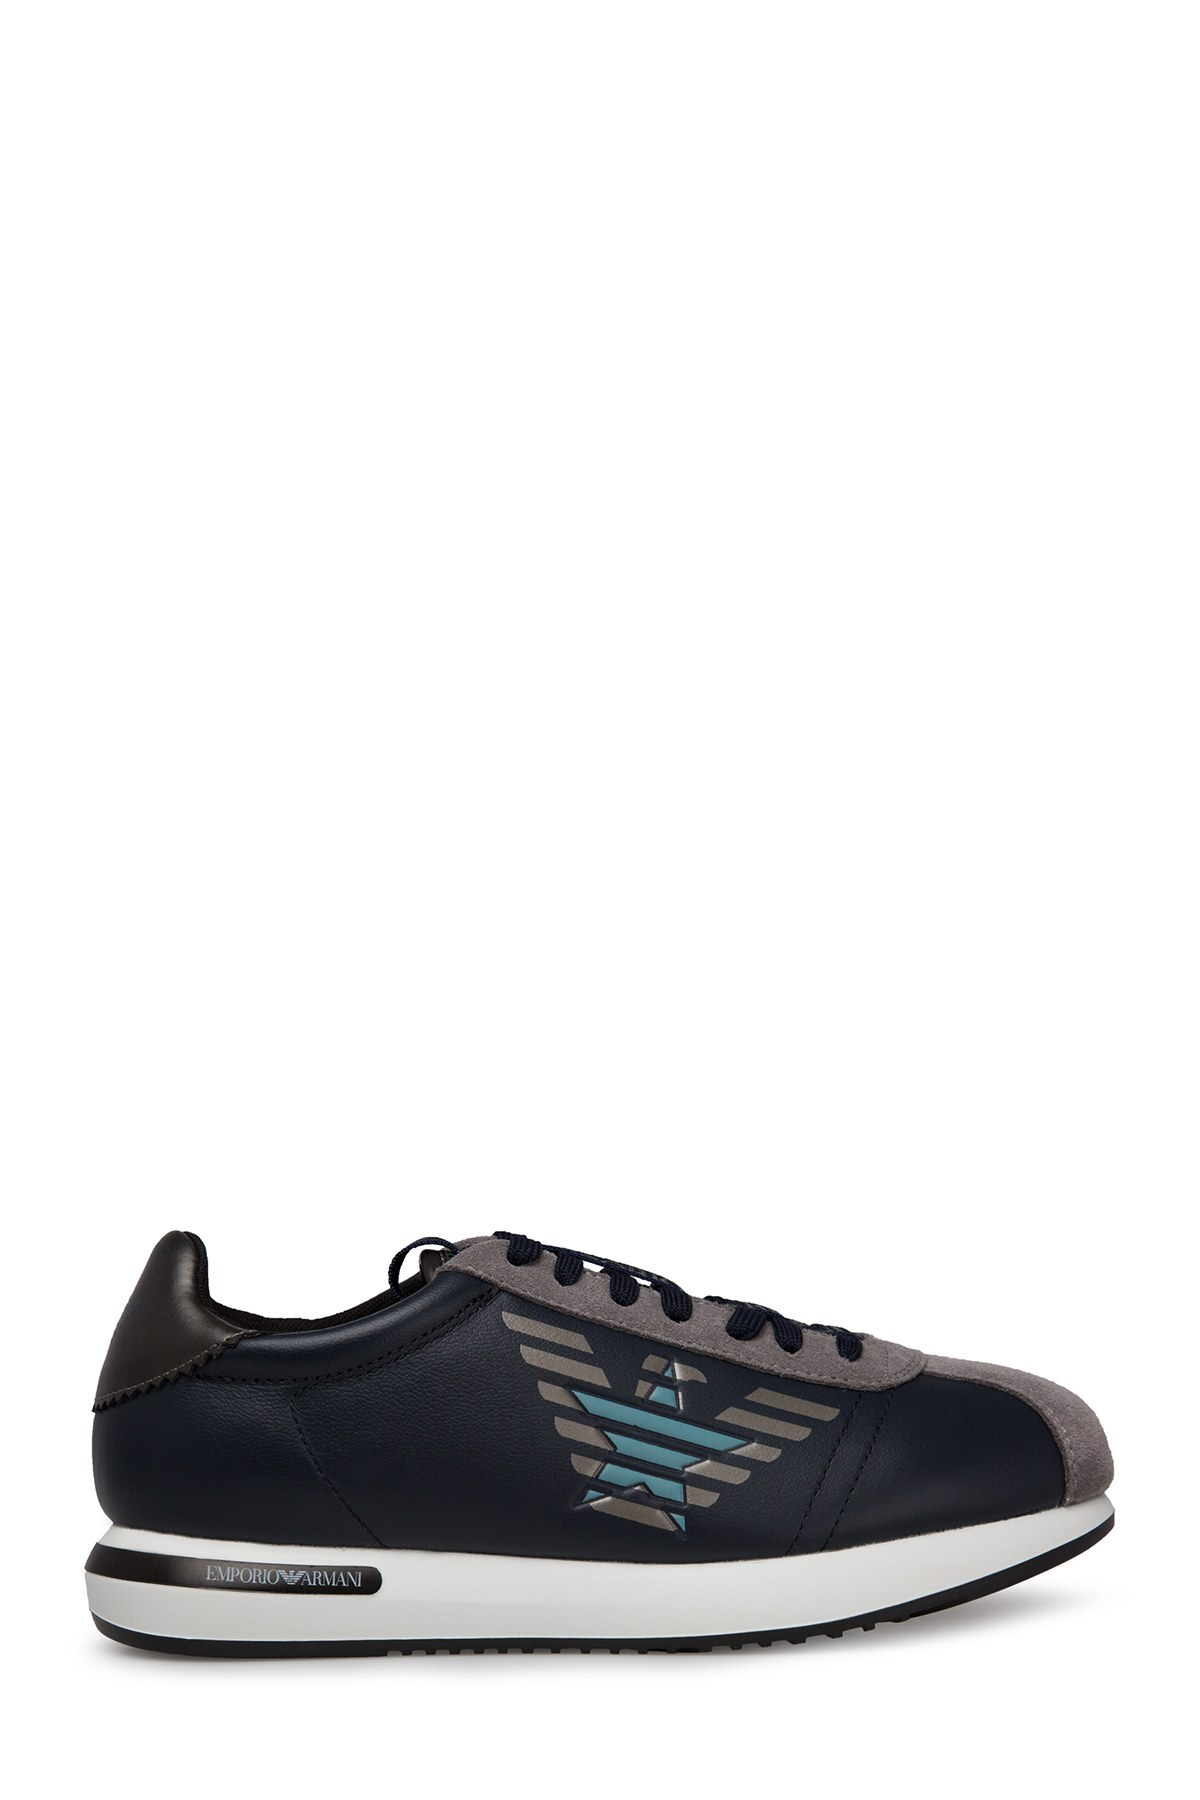 Emporio Armani Erkek Ayakkabı S X4X260 XM050 A823 LACİVERT